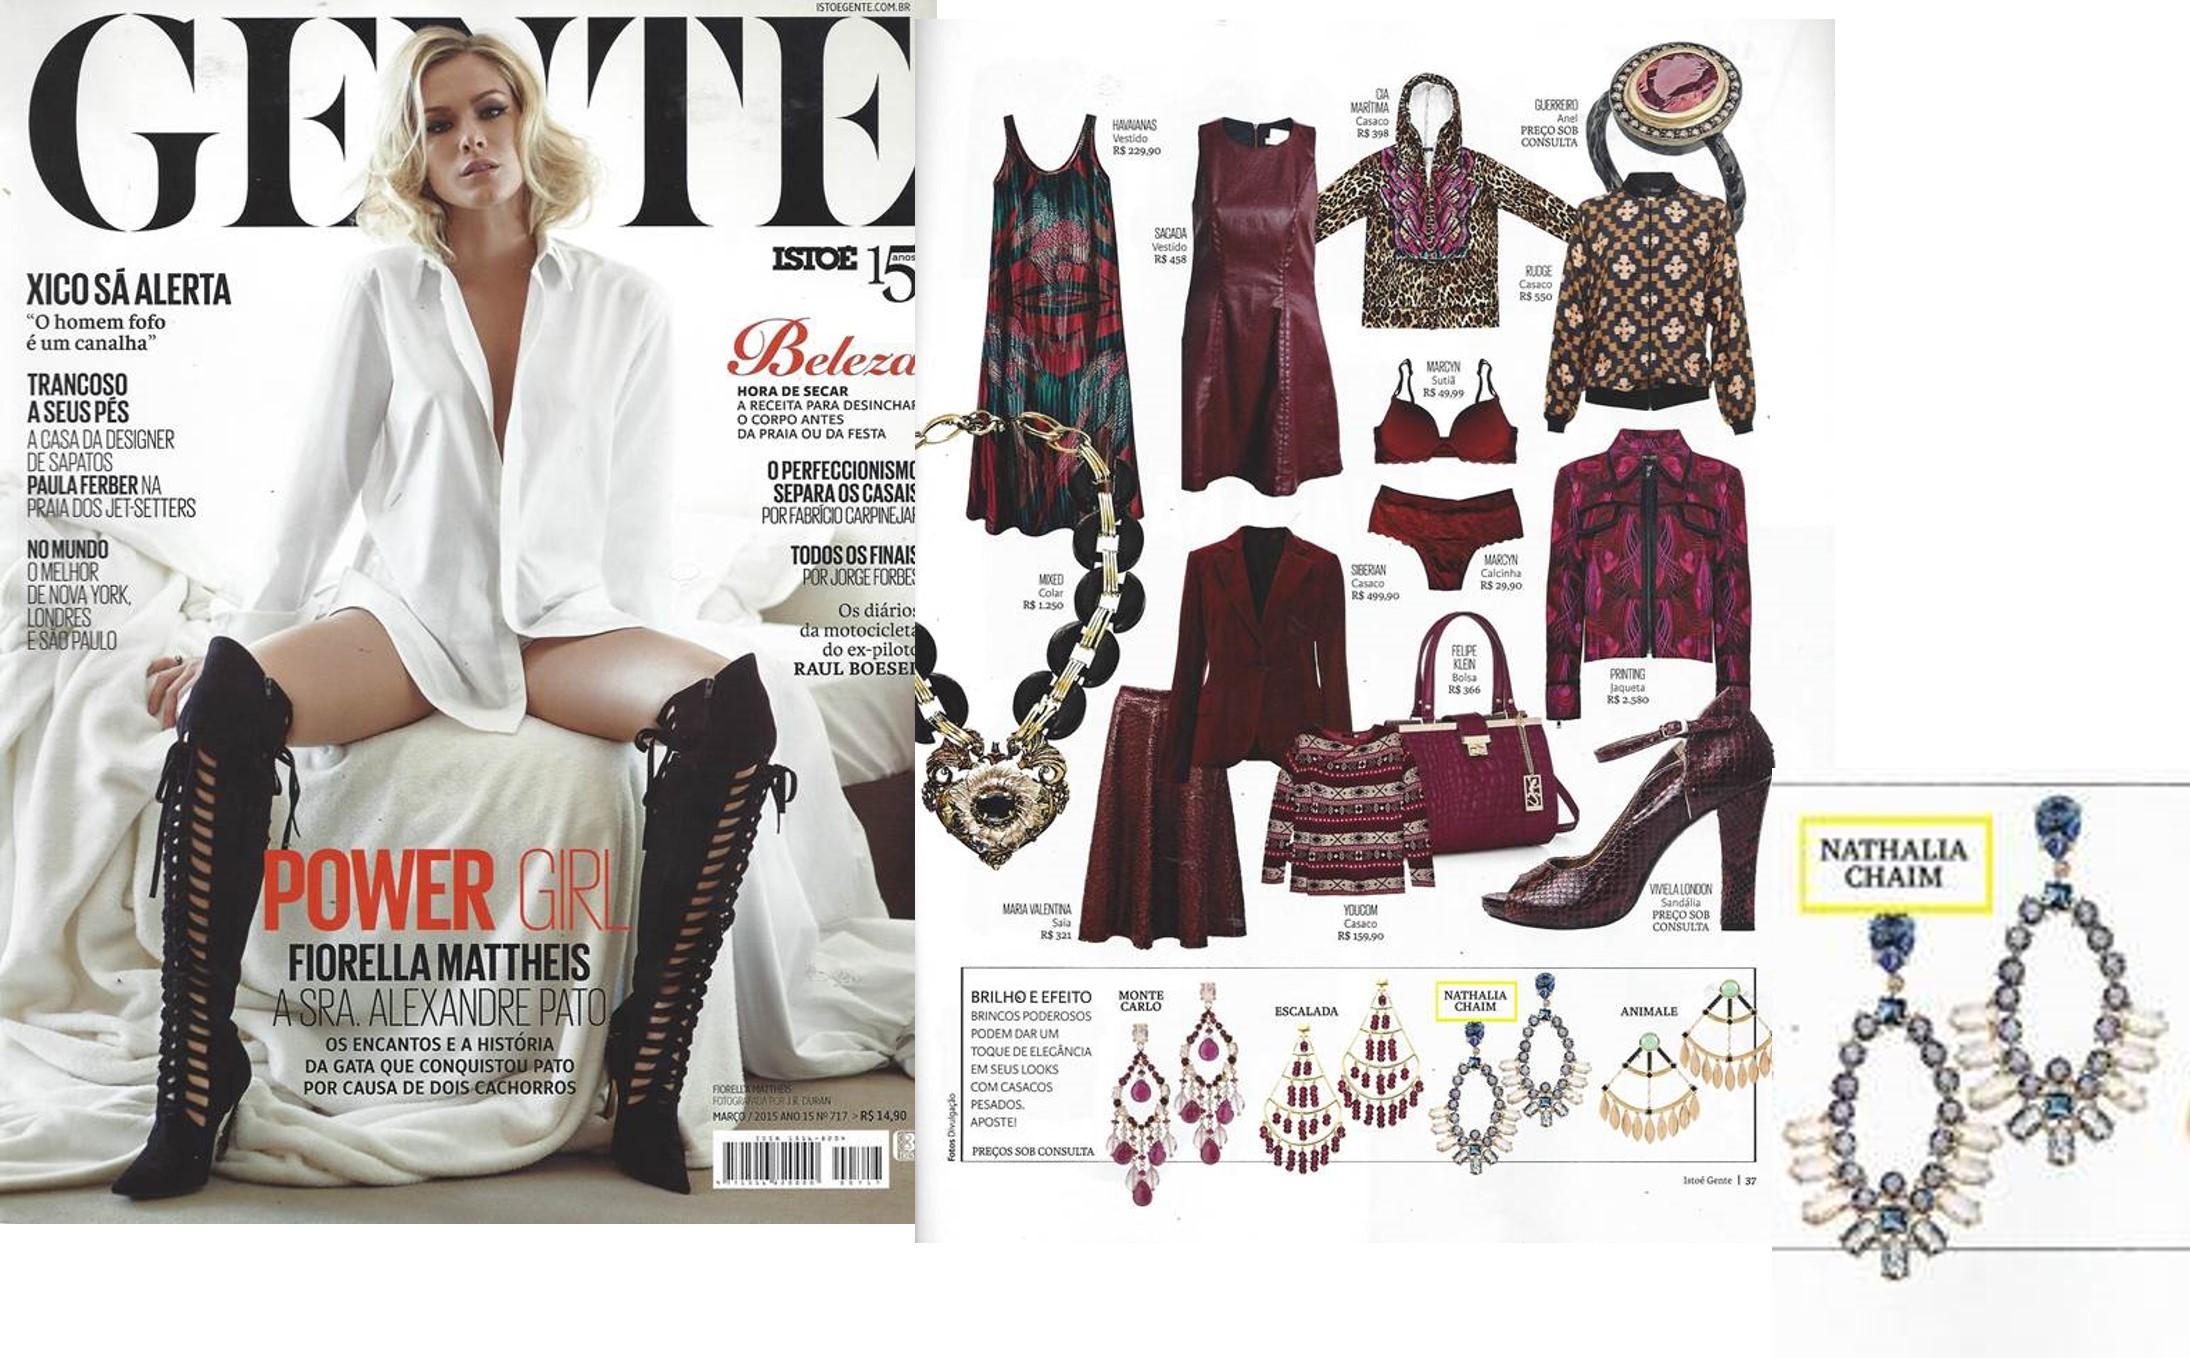 Mar 2015 | Revista Isto é Gente